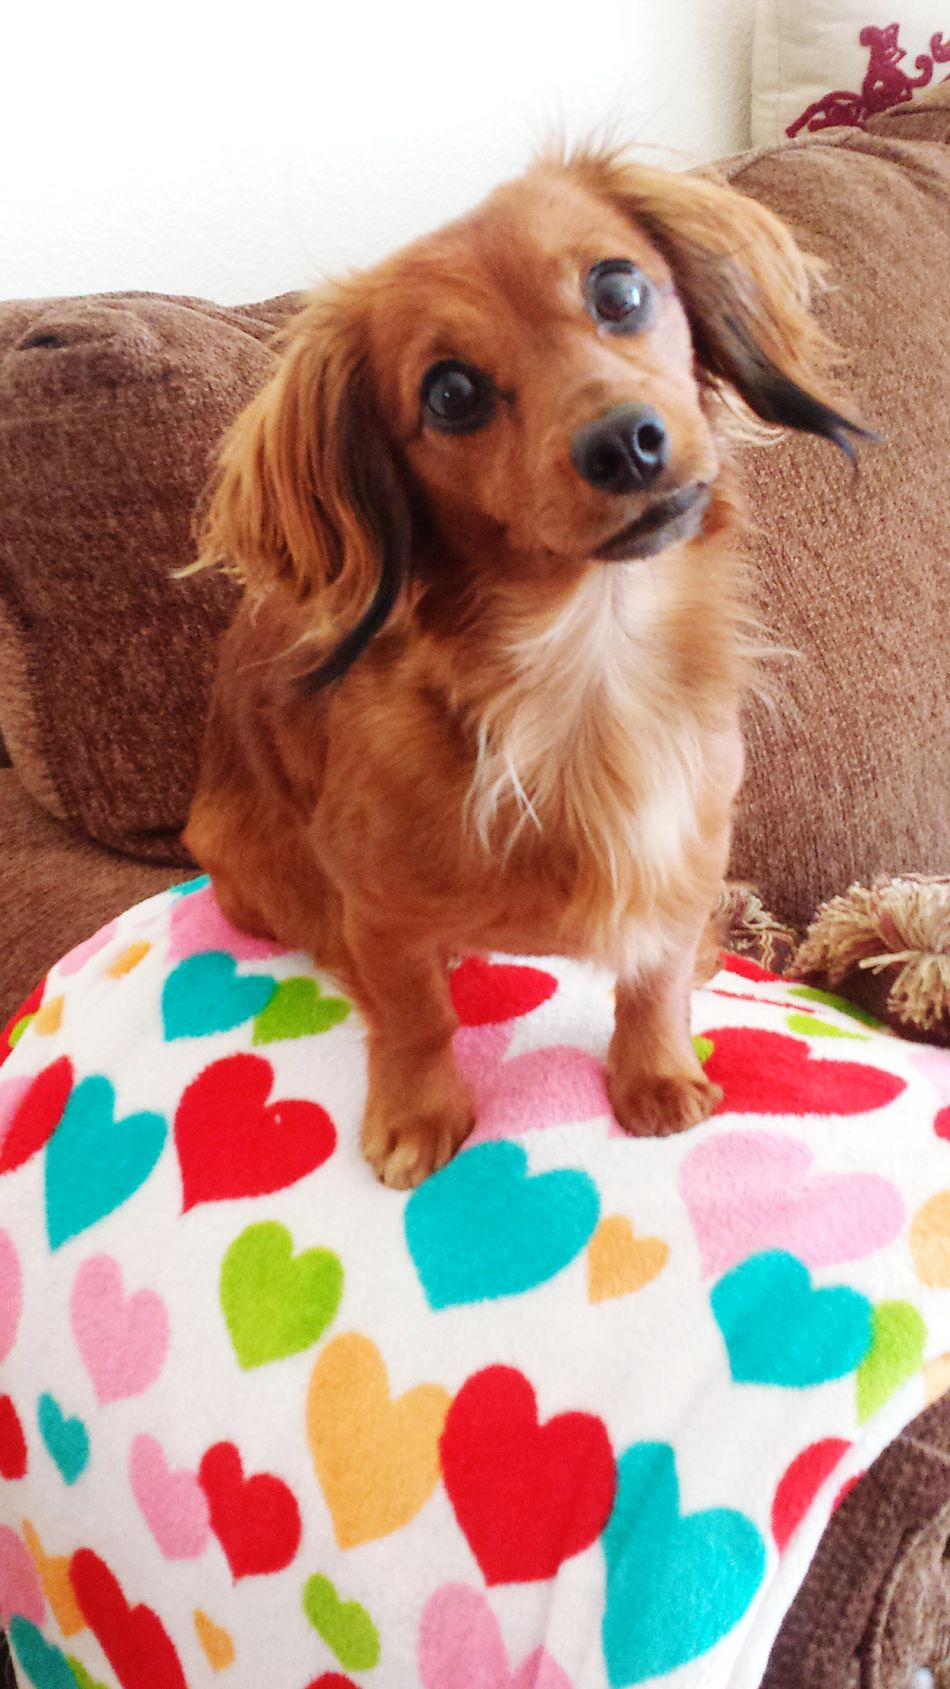 Babygirl Sasha  Daschund Tiny 3yearsold Besutiful_hair Brown Bigbrowneyes Super_cute Dogs Family Hearts Love Couch_life Natural Hair